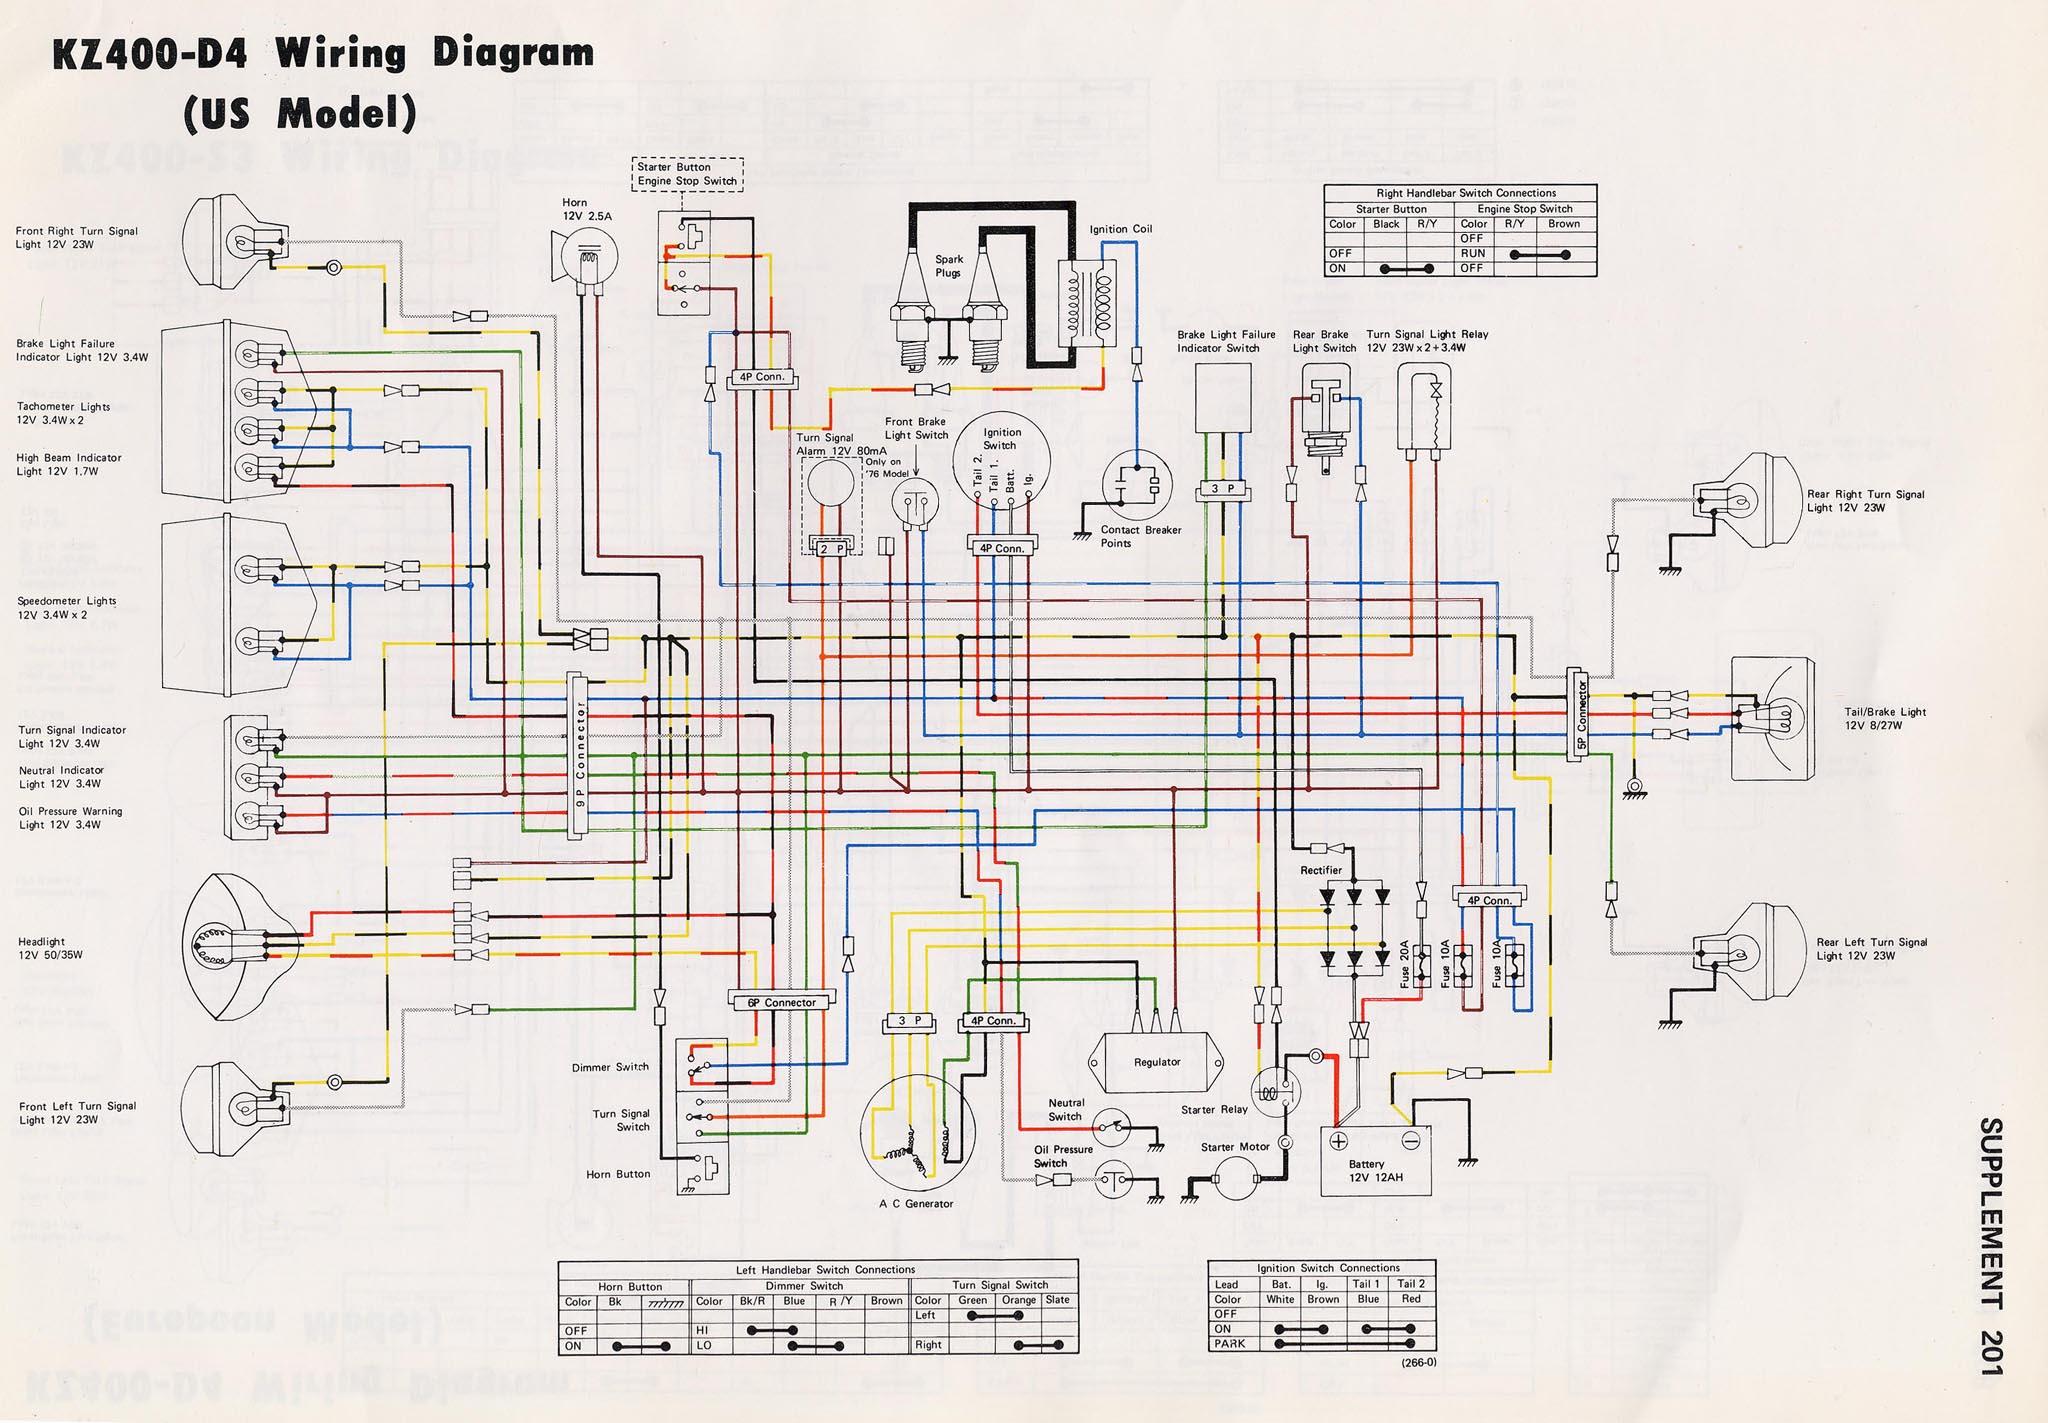 Kz400 Wiring Diagram Schematics 1983 Kawasaki Motorcycle Diagrams